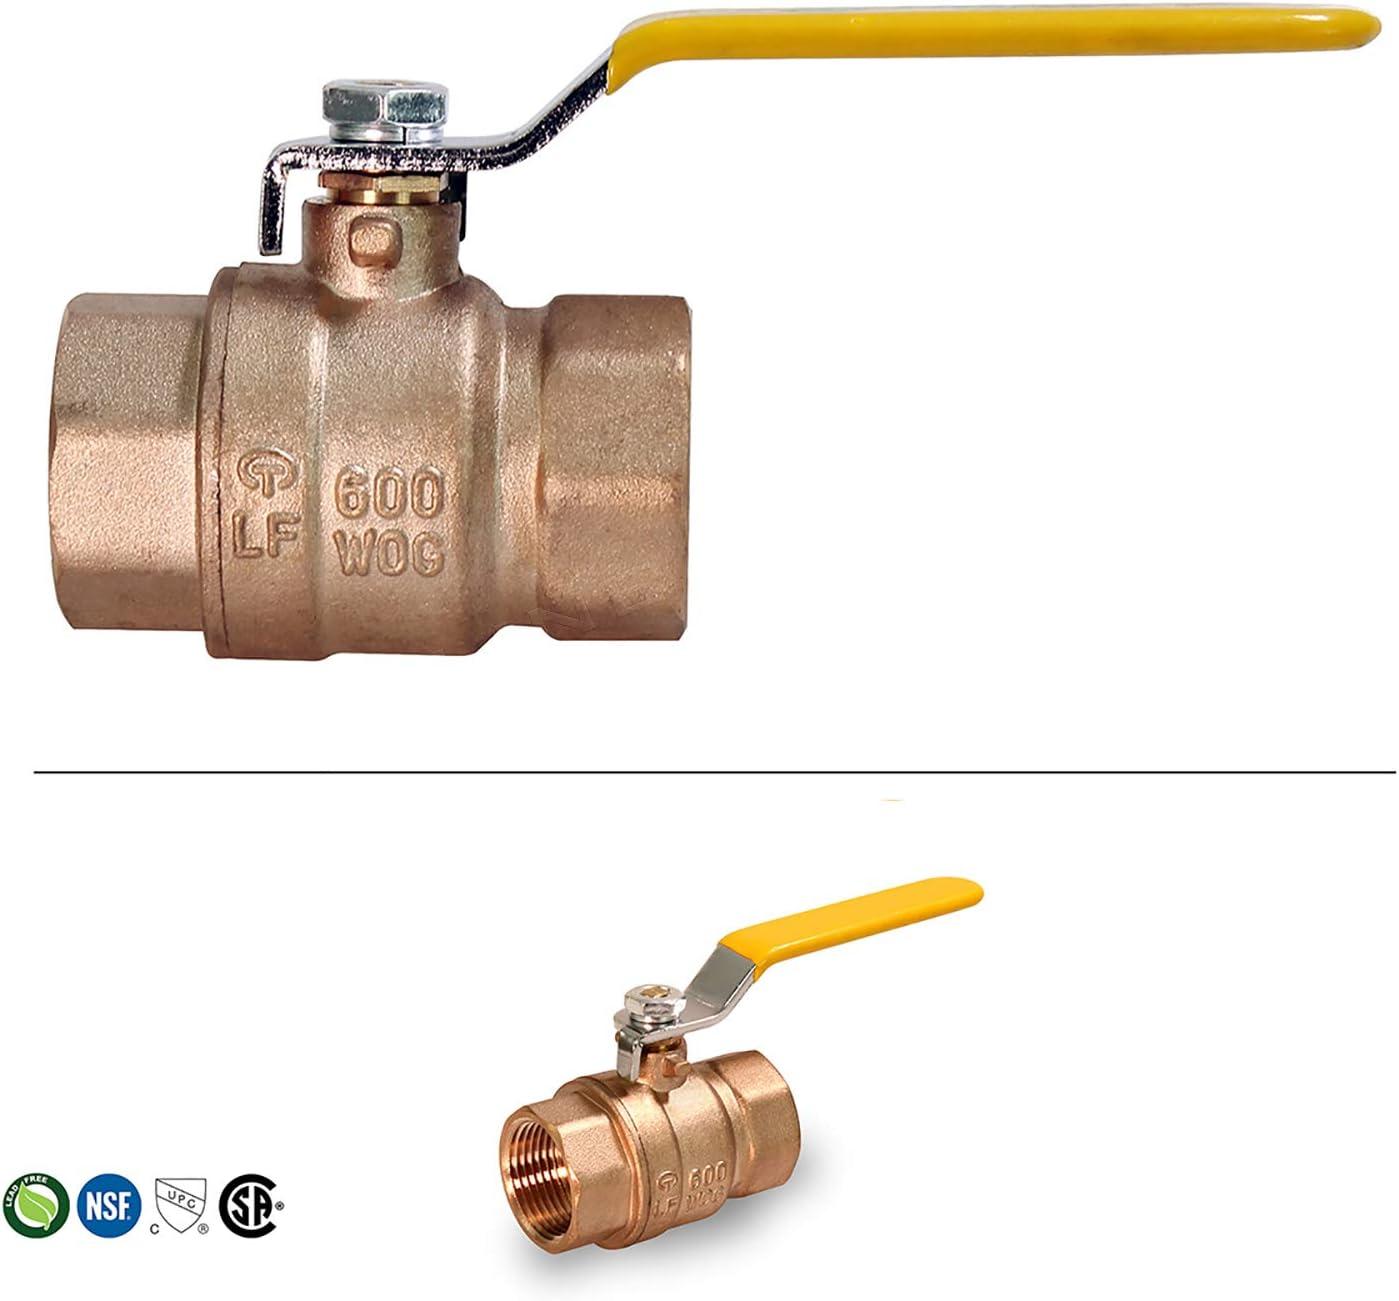 1//4,3//8,1//2male and Female Ball Valve External Thread,Brass Ball Valve,Copper Valve DORLIONA 1//4 : 5pcs//lot Copper Fitting